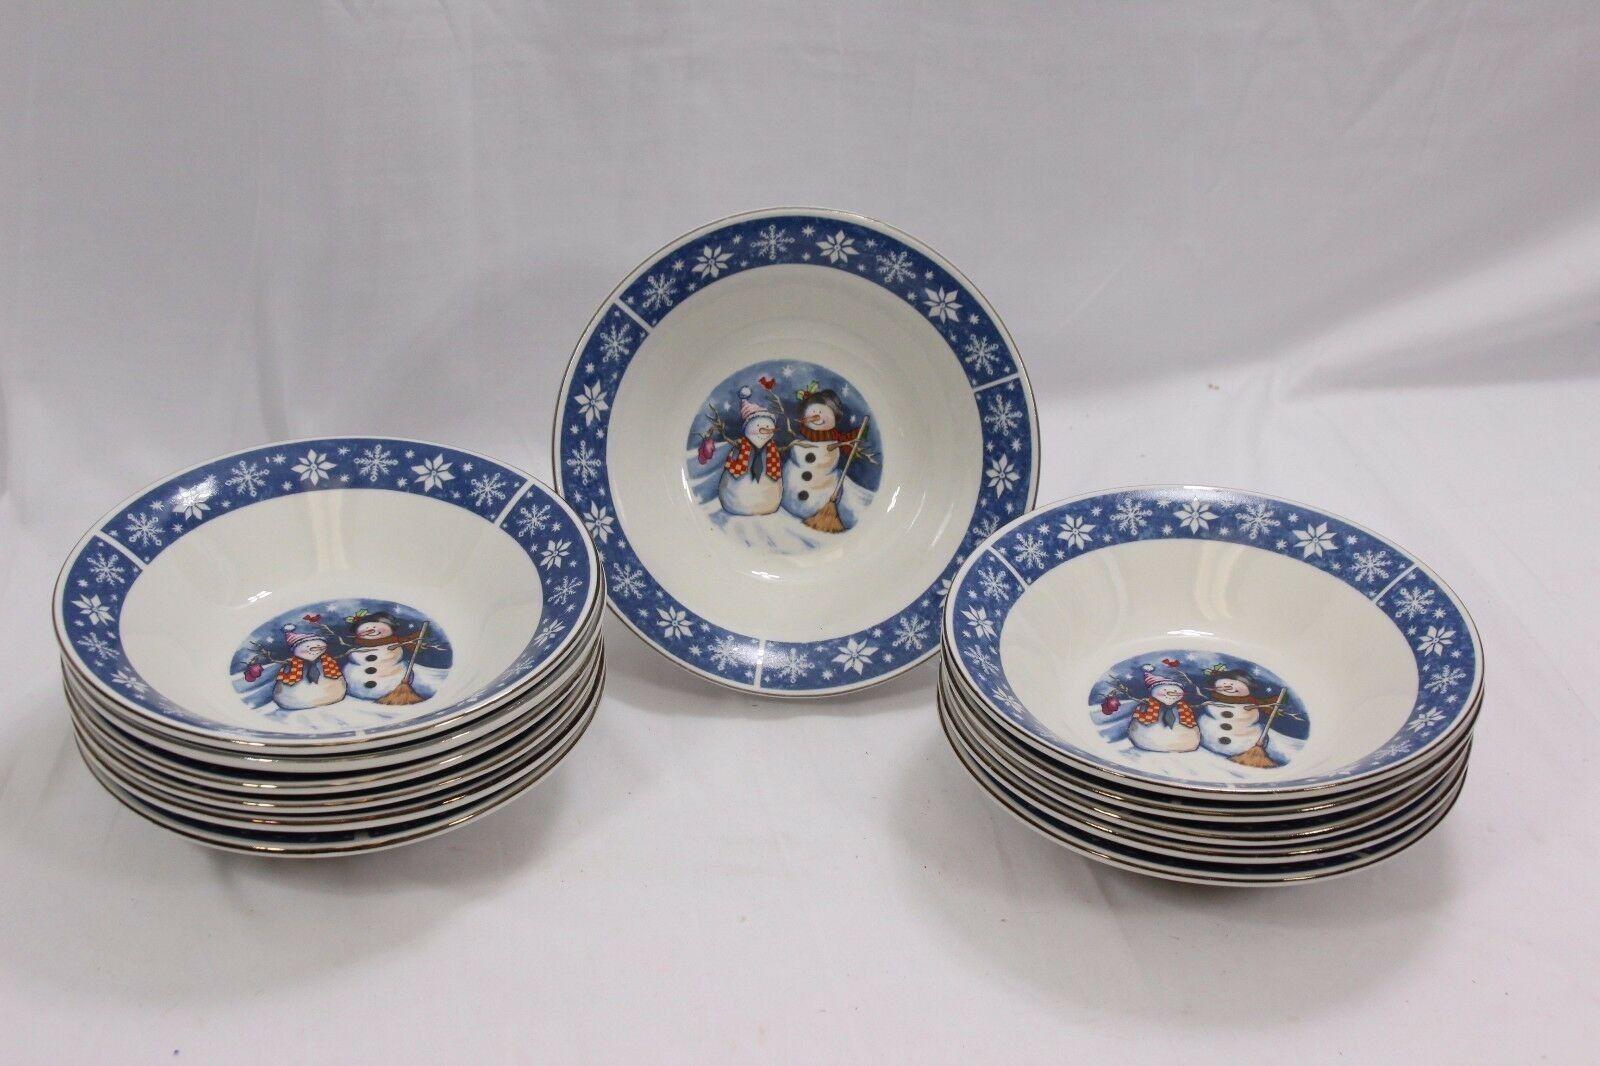 Crofton Snowmen Soup Cereal Bowls 7.5  Set of 12 Xmas